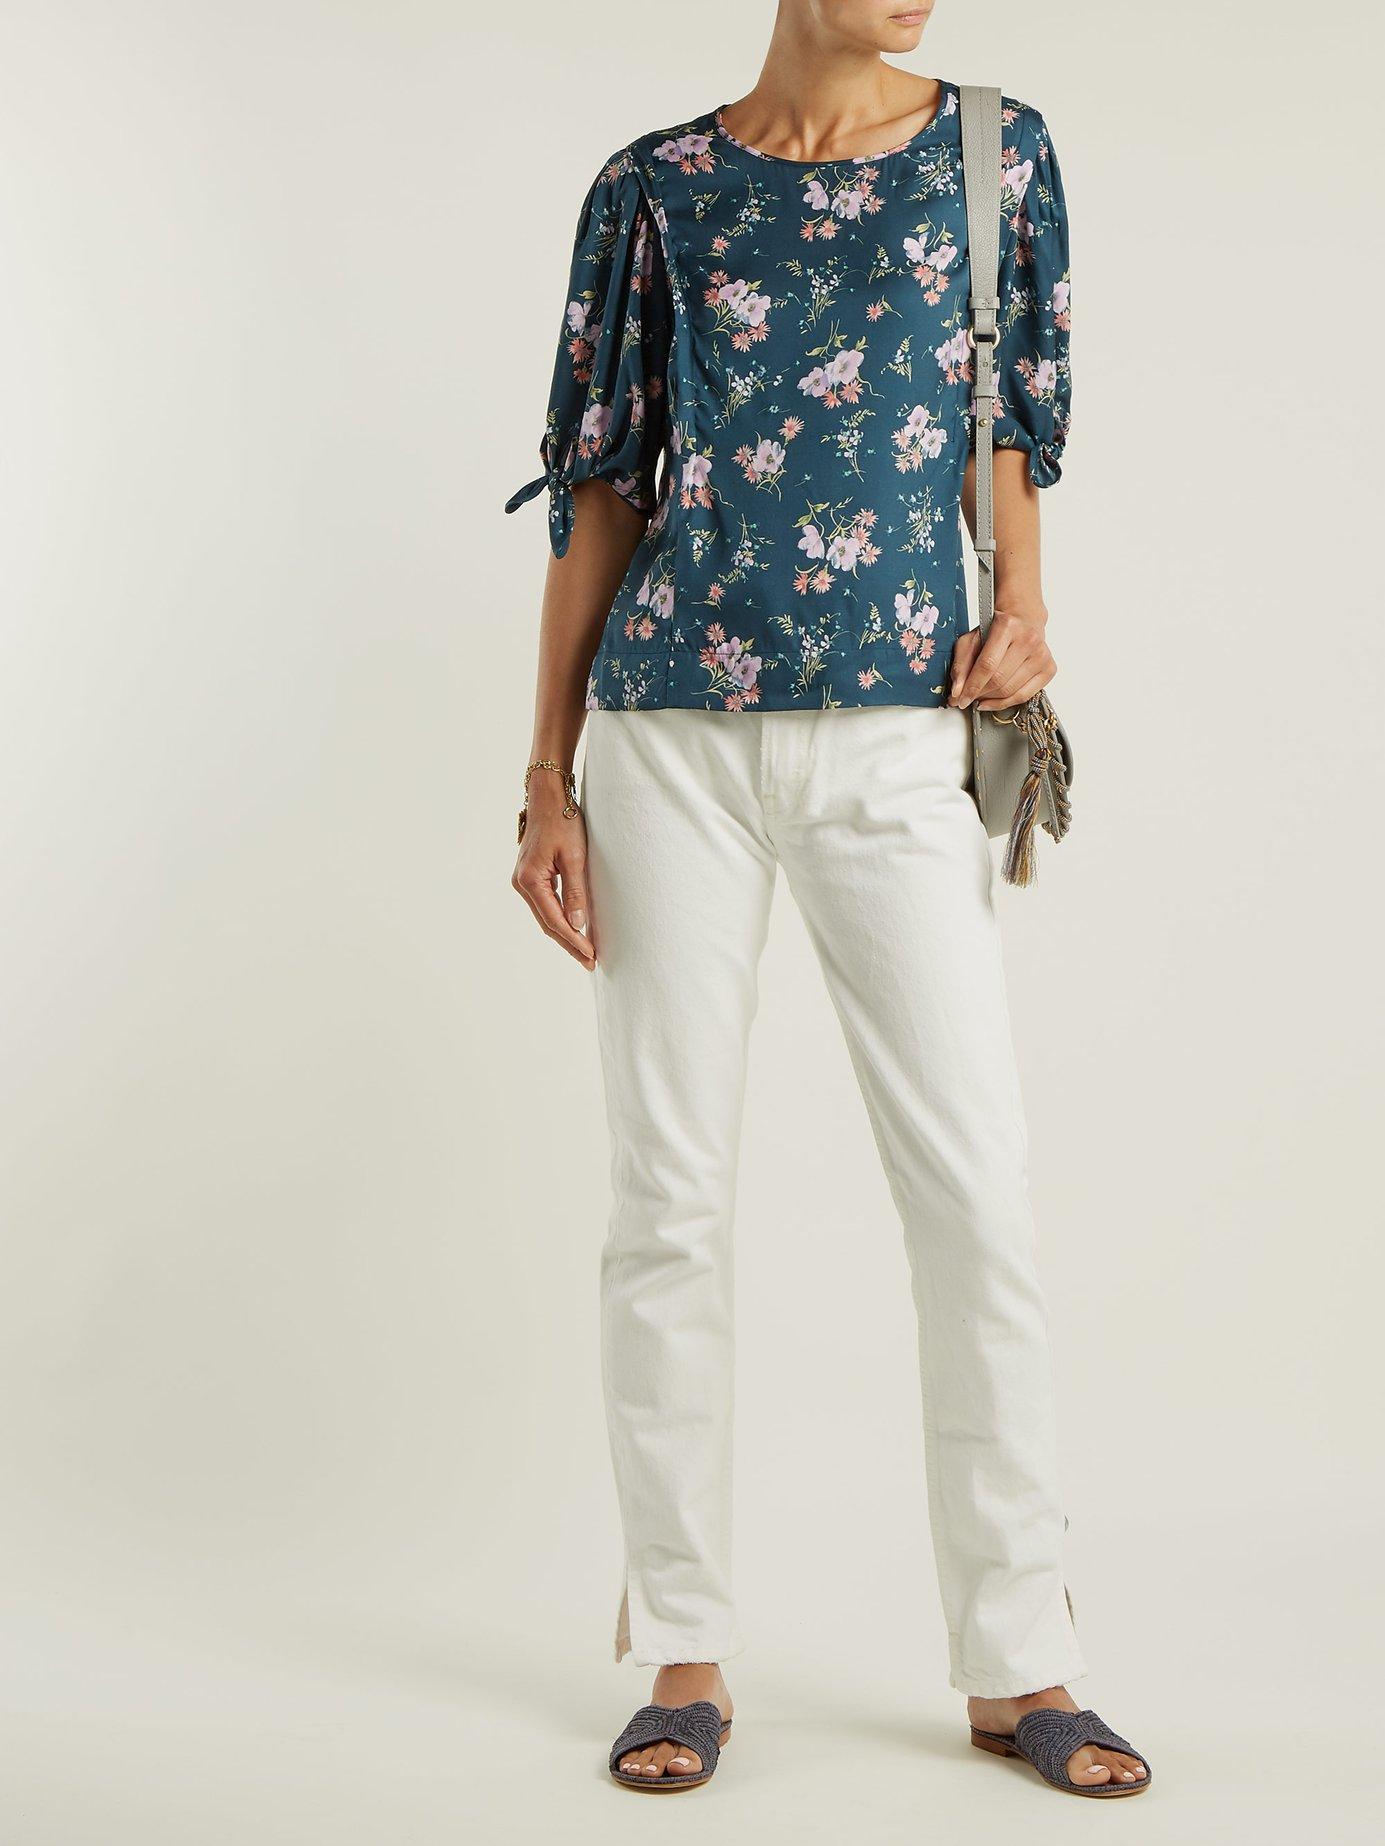 Emilia floral-print silk-twill top by Rebecca Taylor